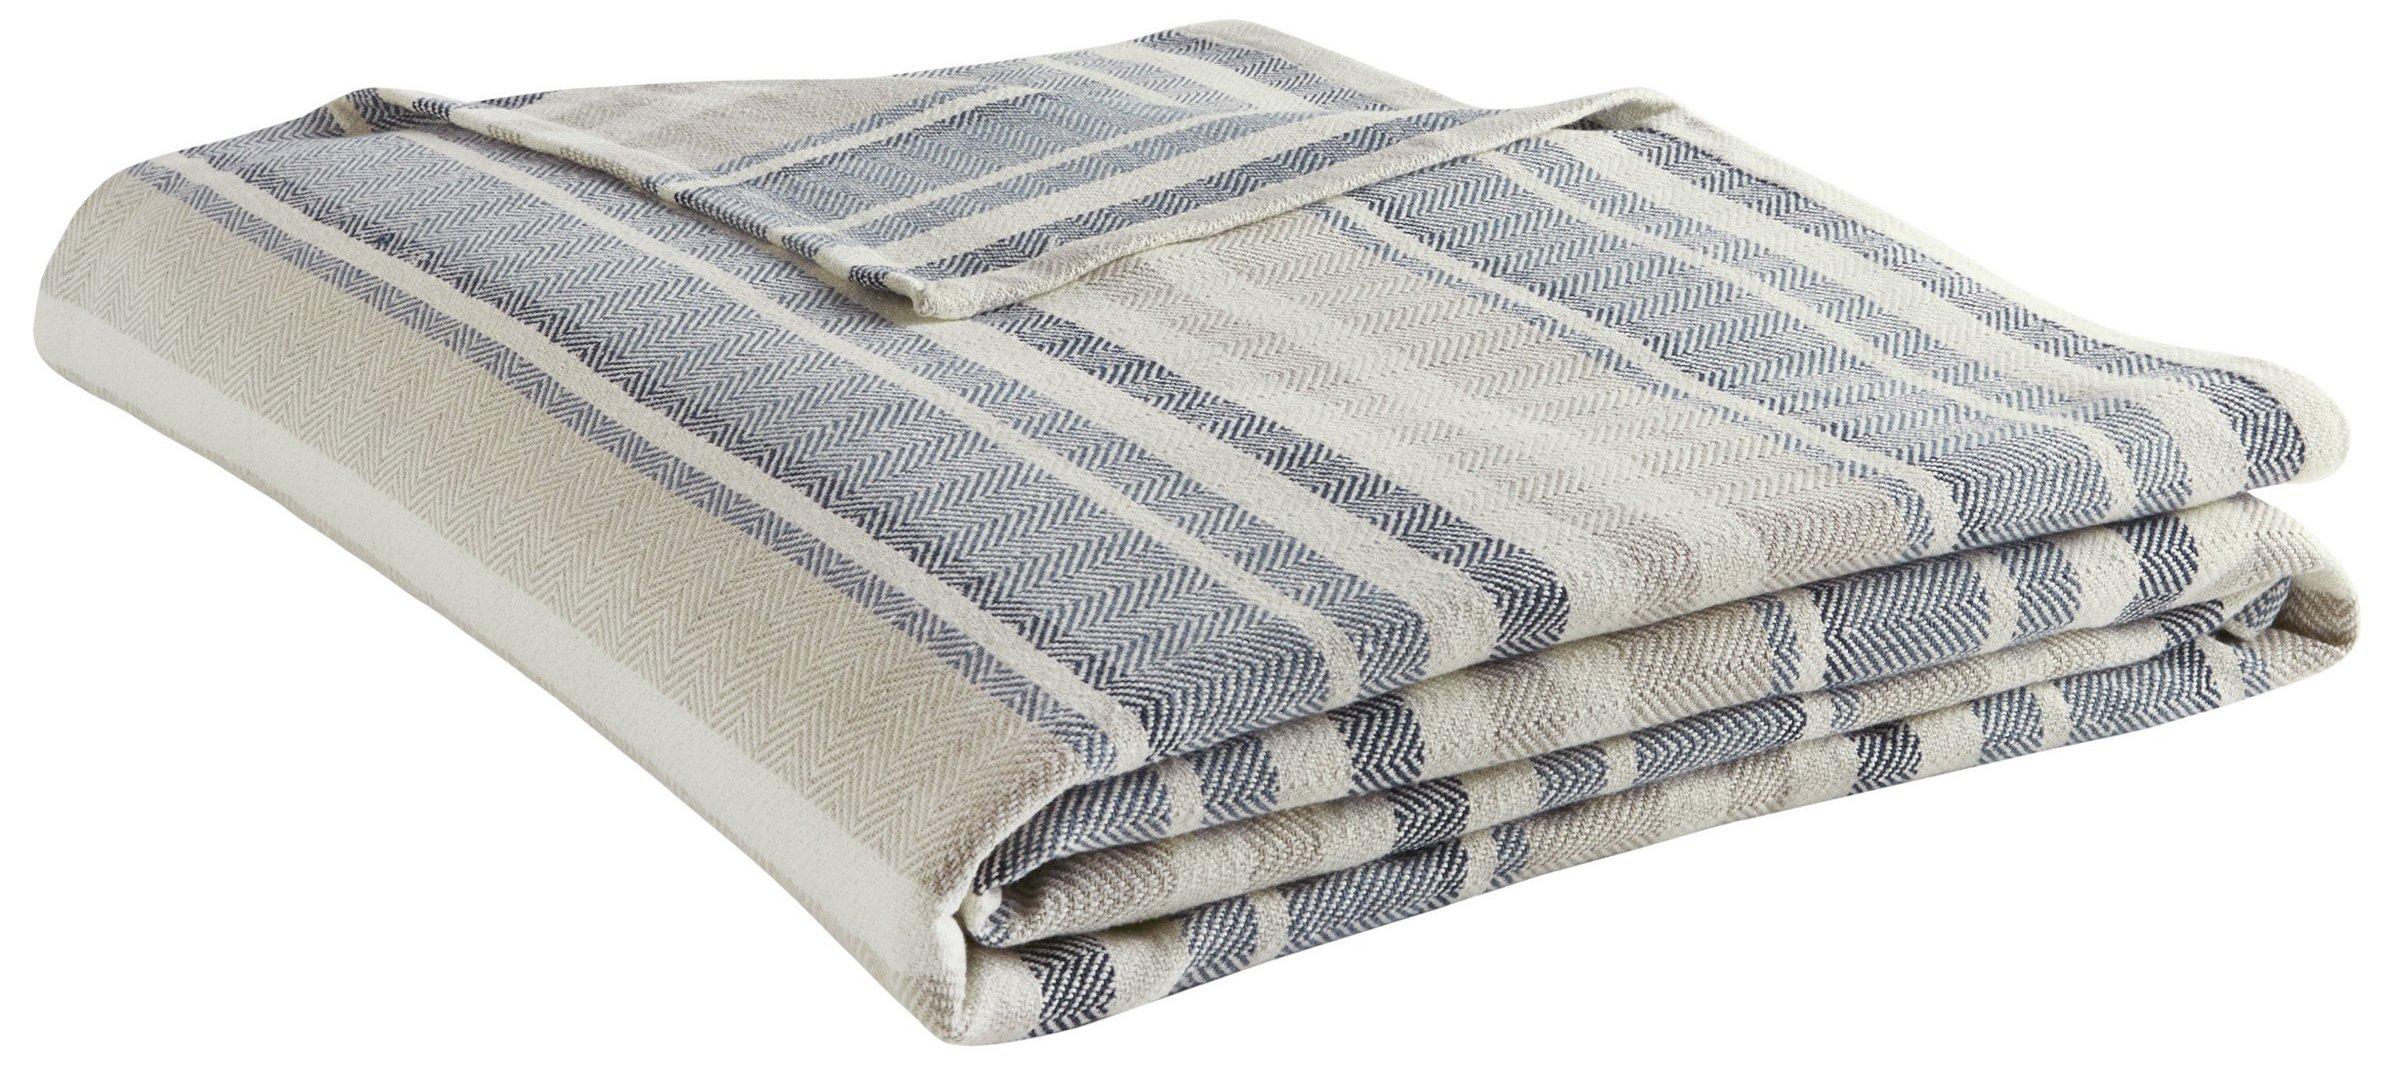 Eddie Bauer 213124 Herringbone Blanket, King, Blue Stripe - King size 90x108 100% Cotton Hemmed on all four sides - blankets-throws, bedroom-sheets-comforters, bedroom - 81RE2CjJBDL -